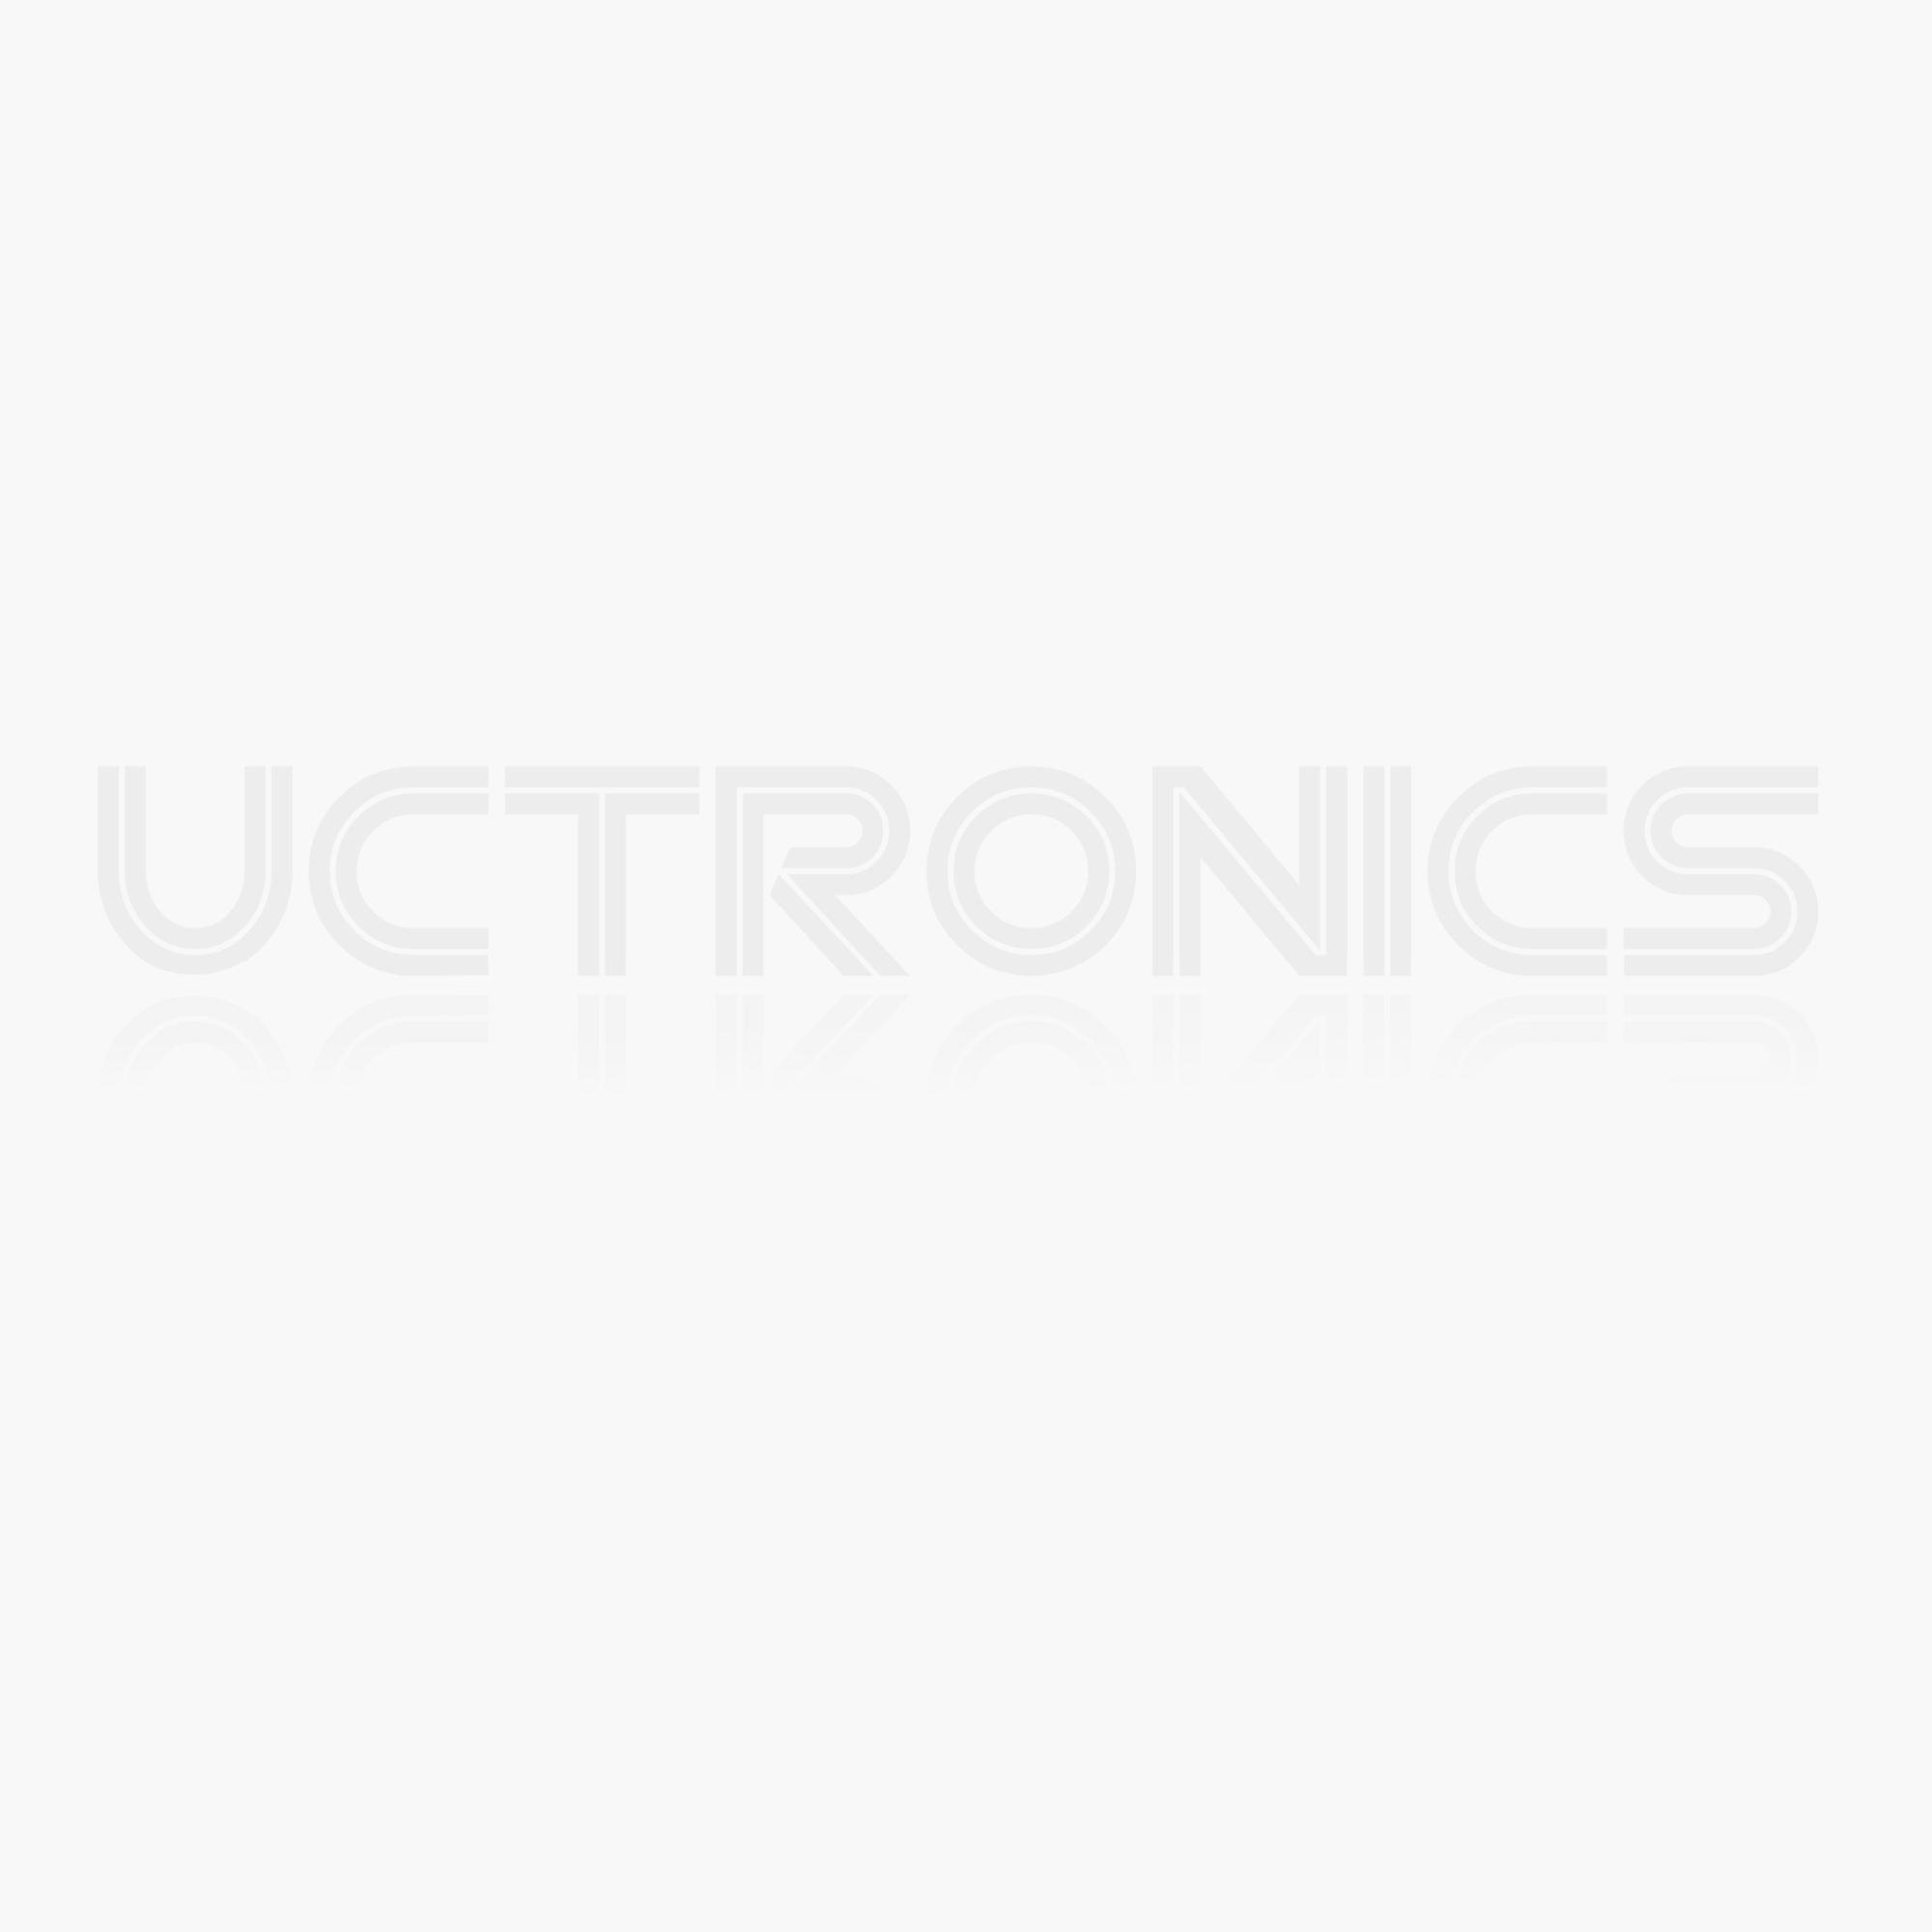 KBJ15005 15A 1000V Single Phase Silicon Bridge Rectifier Diode 4Pin